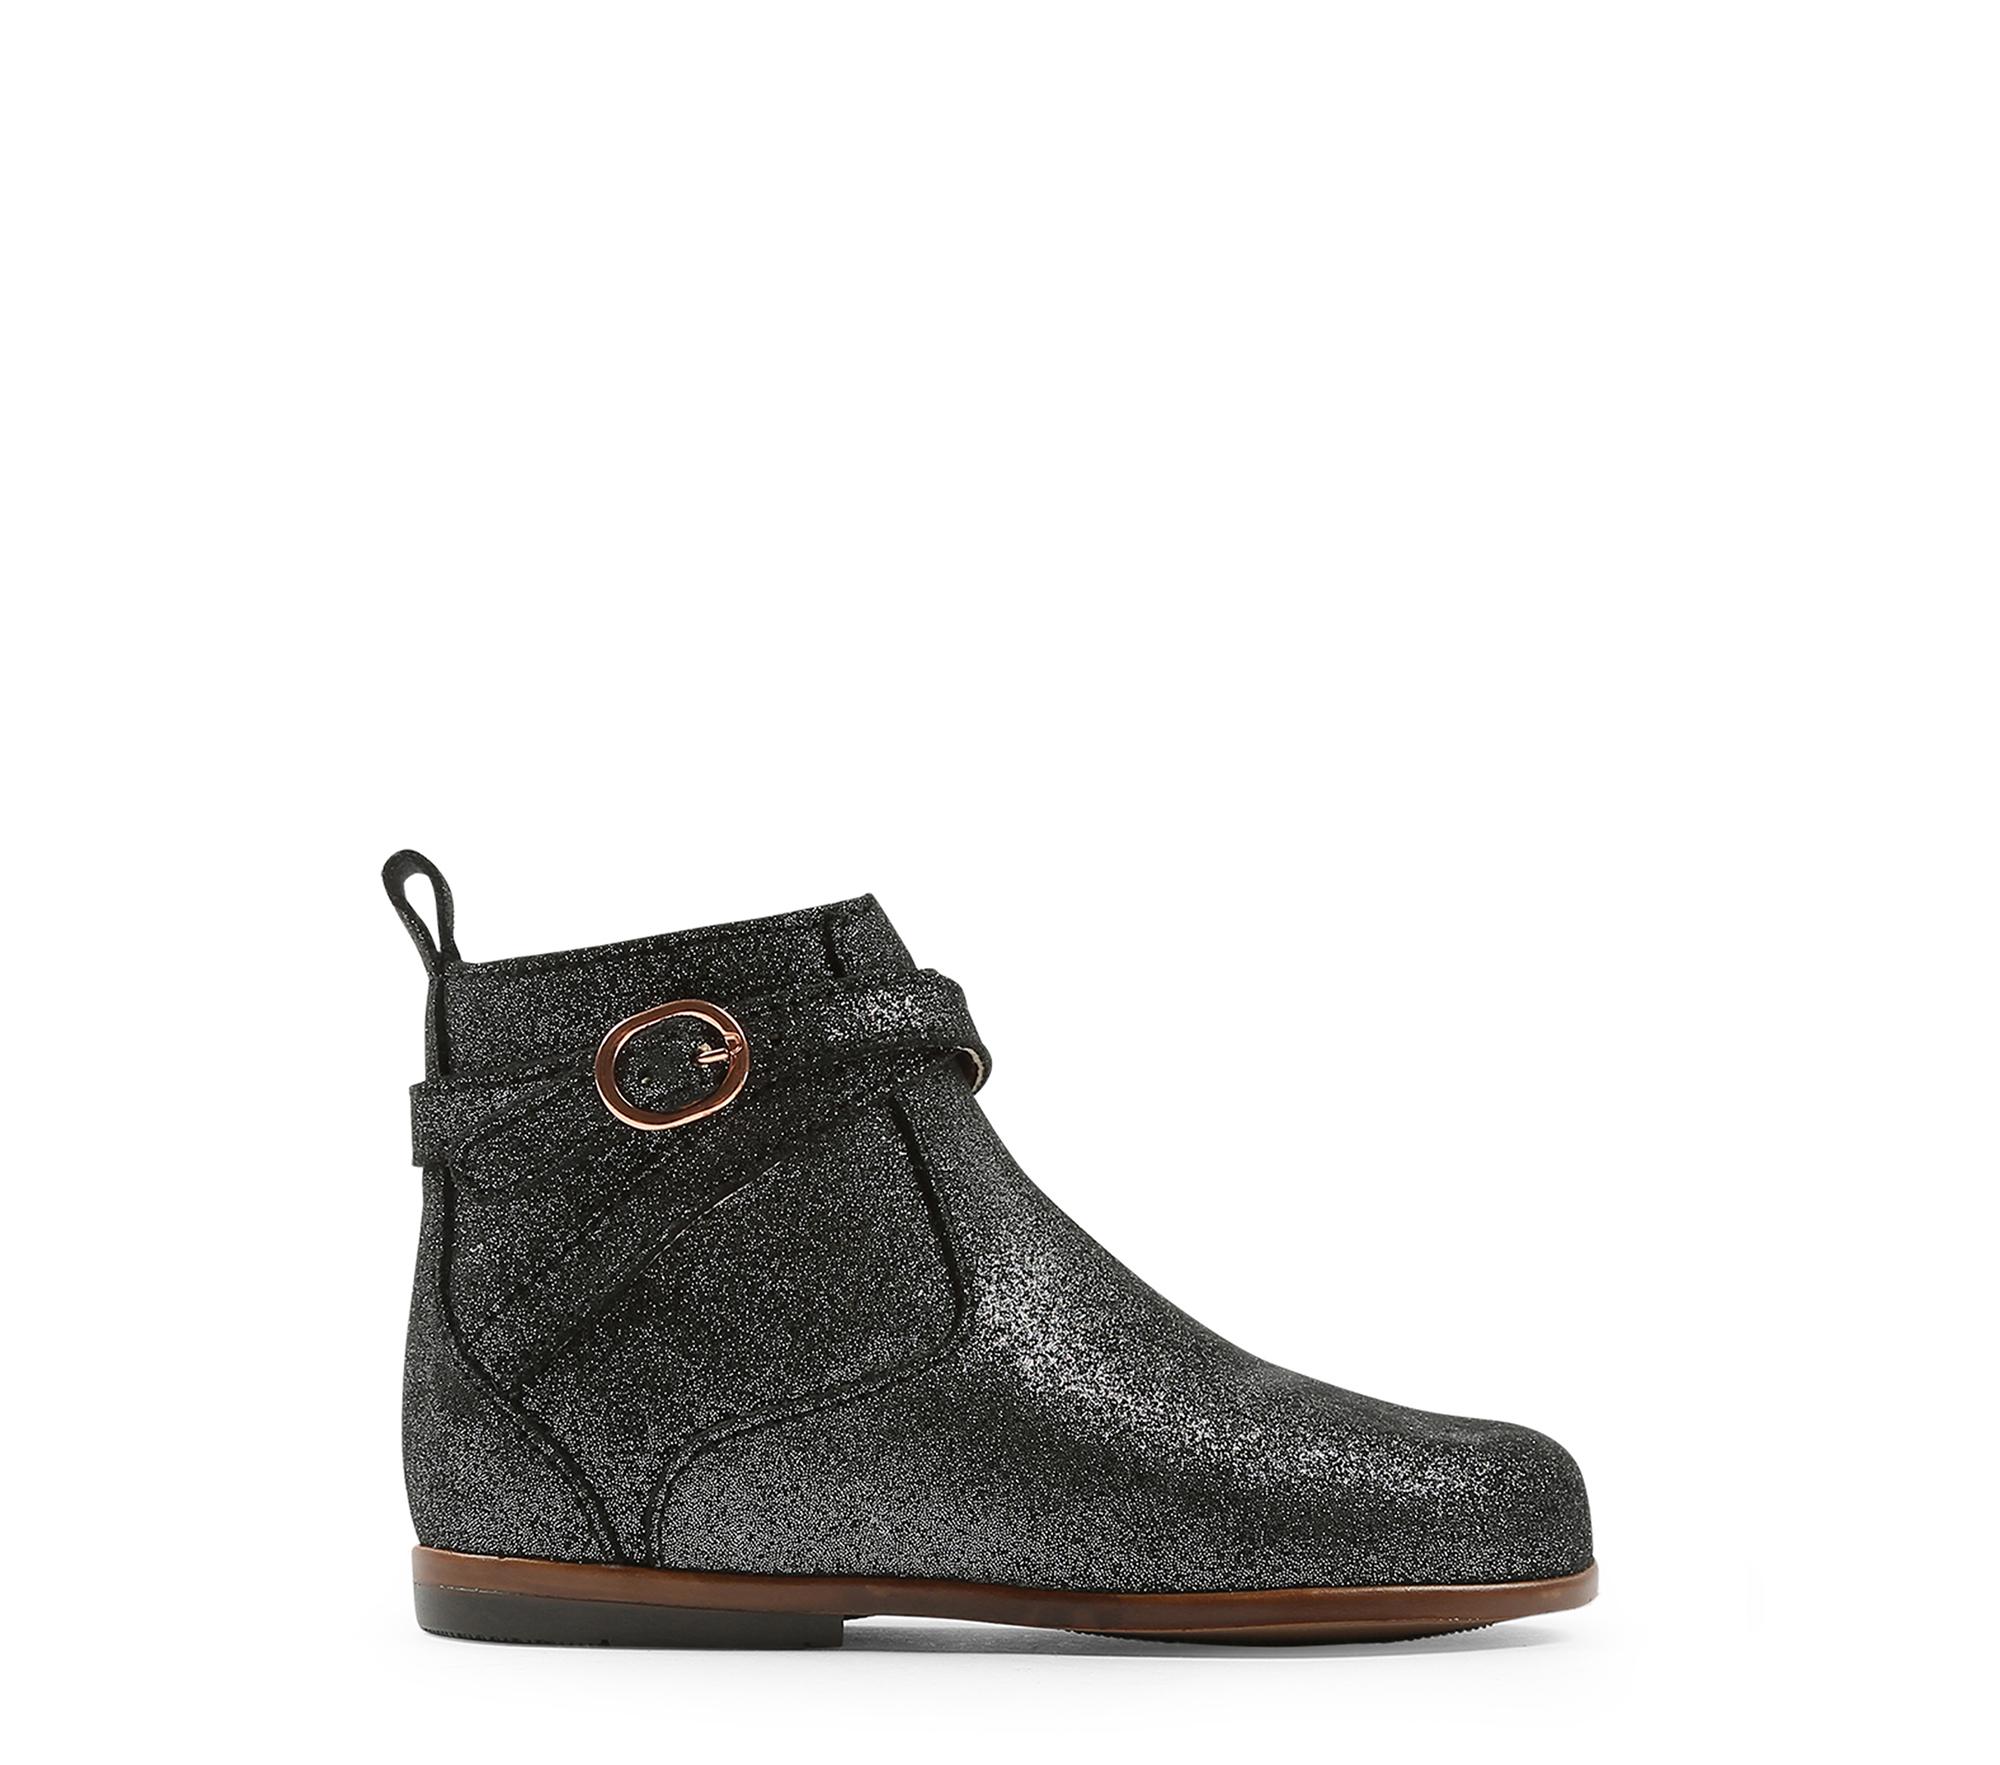 Mec boots - Toddler